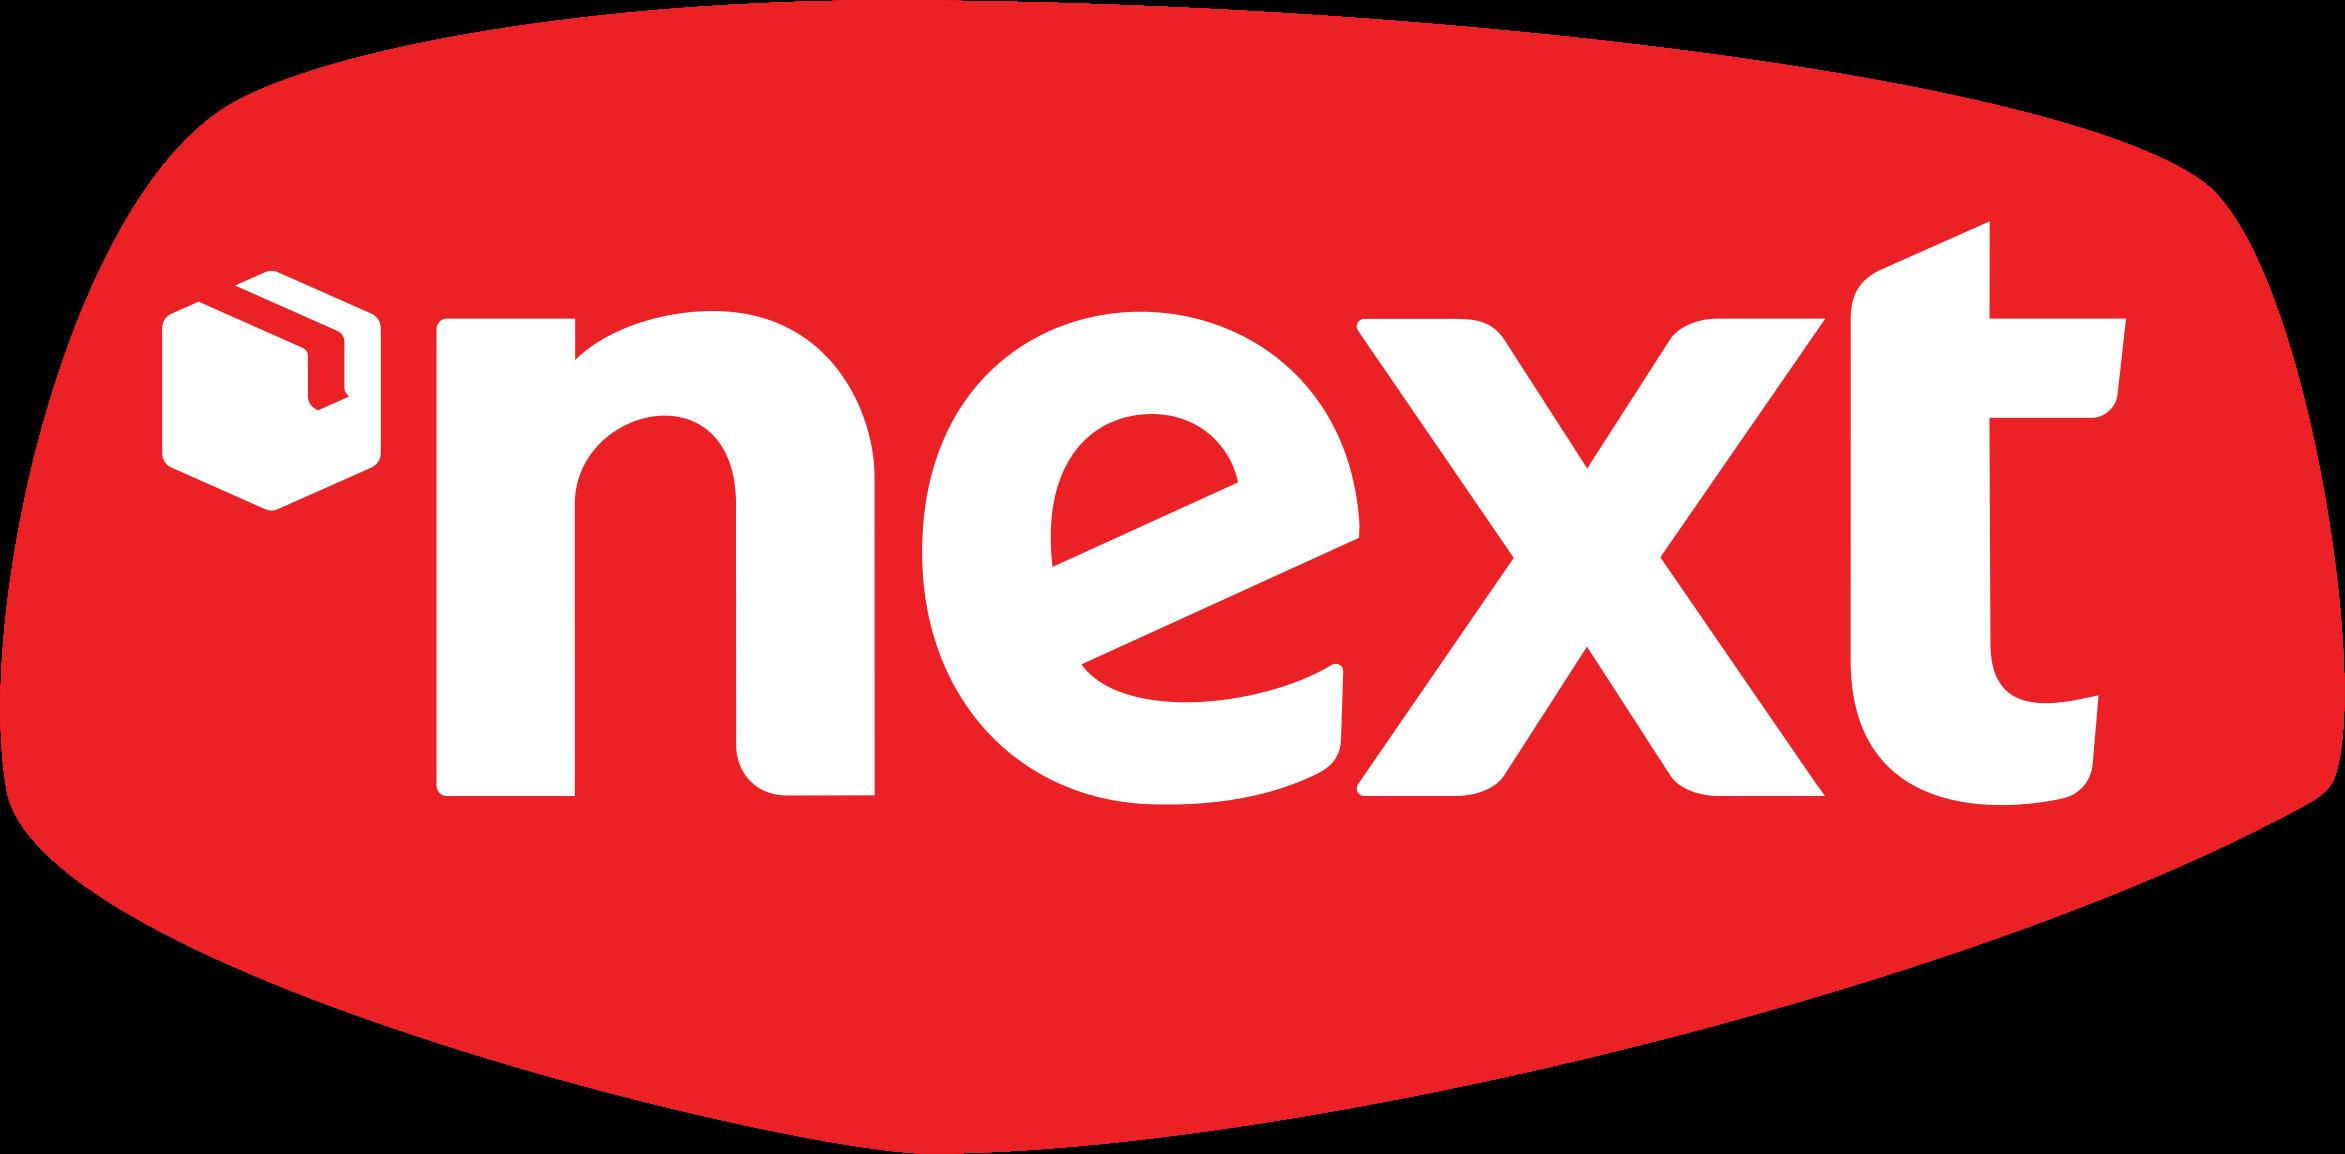 File:Next logo.png - Wikimedia Commons